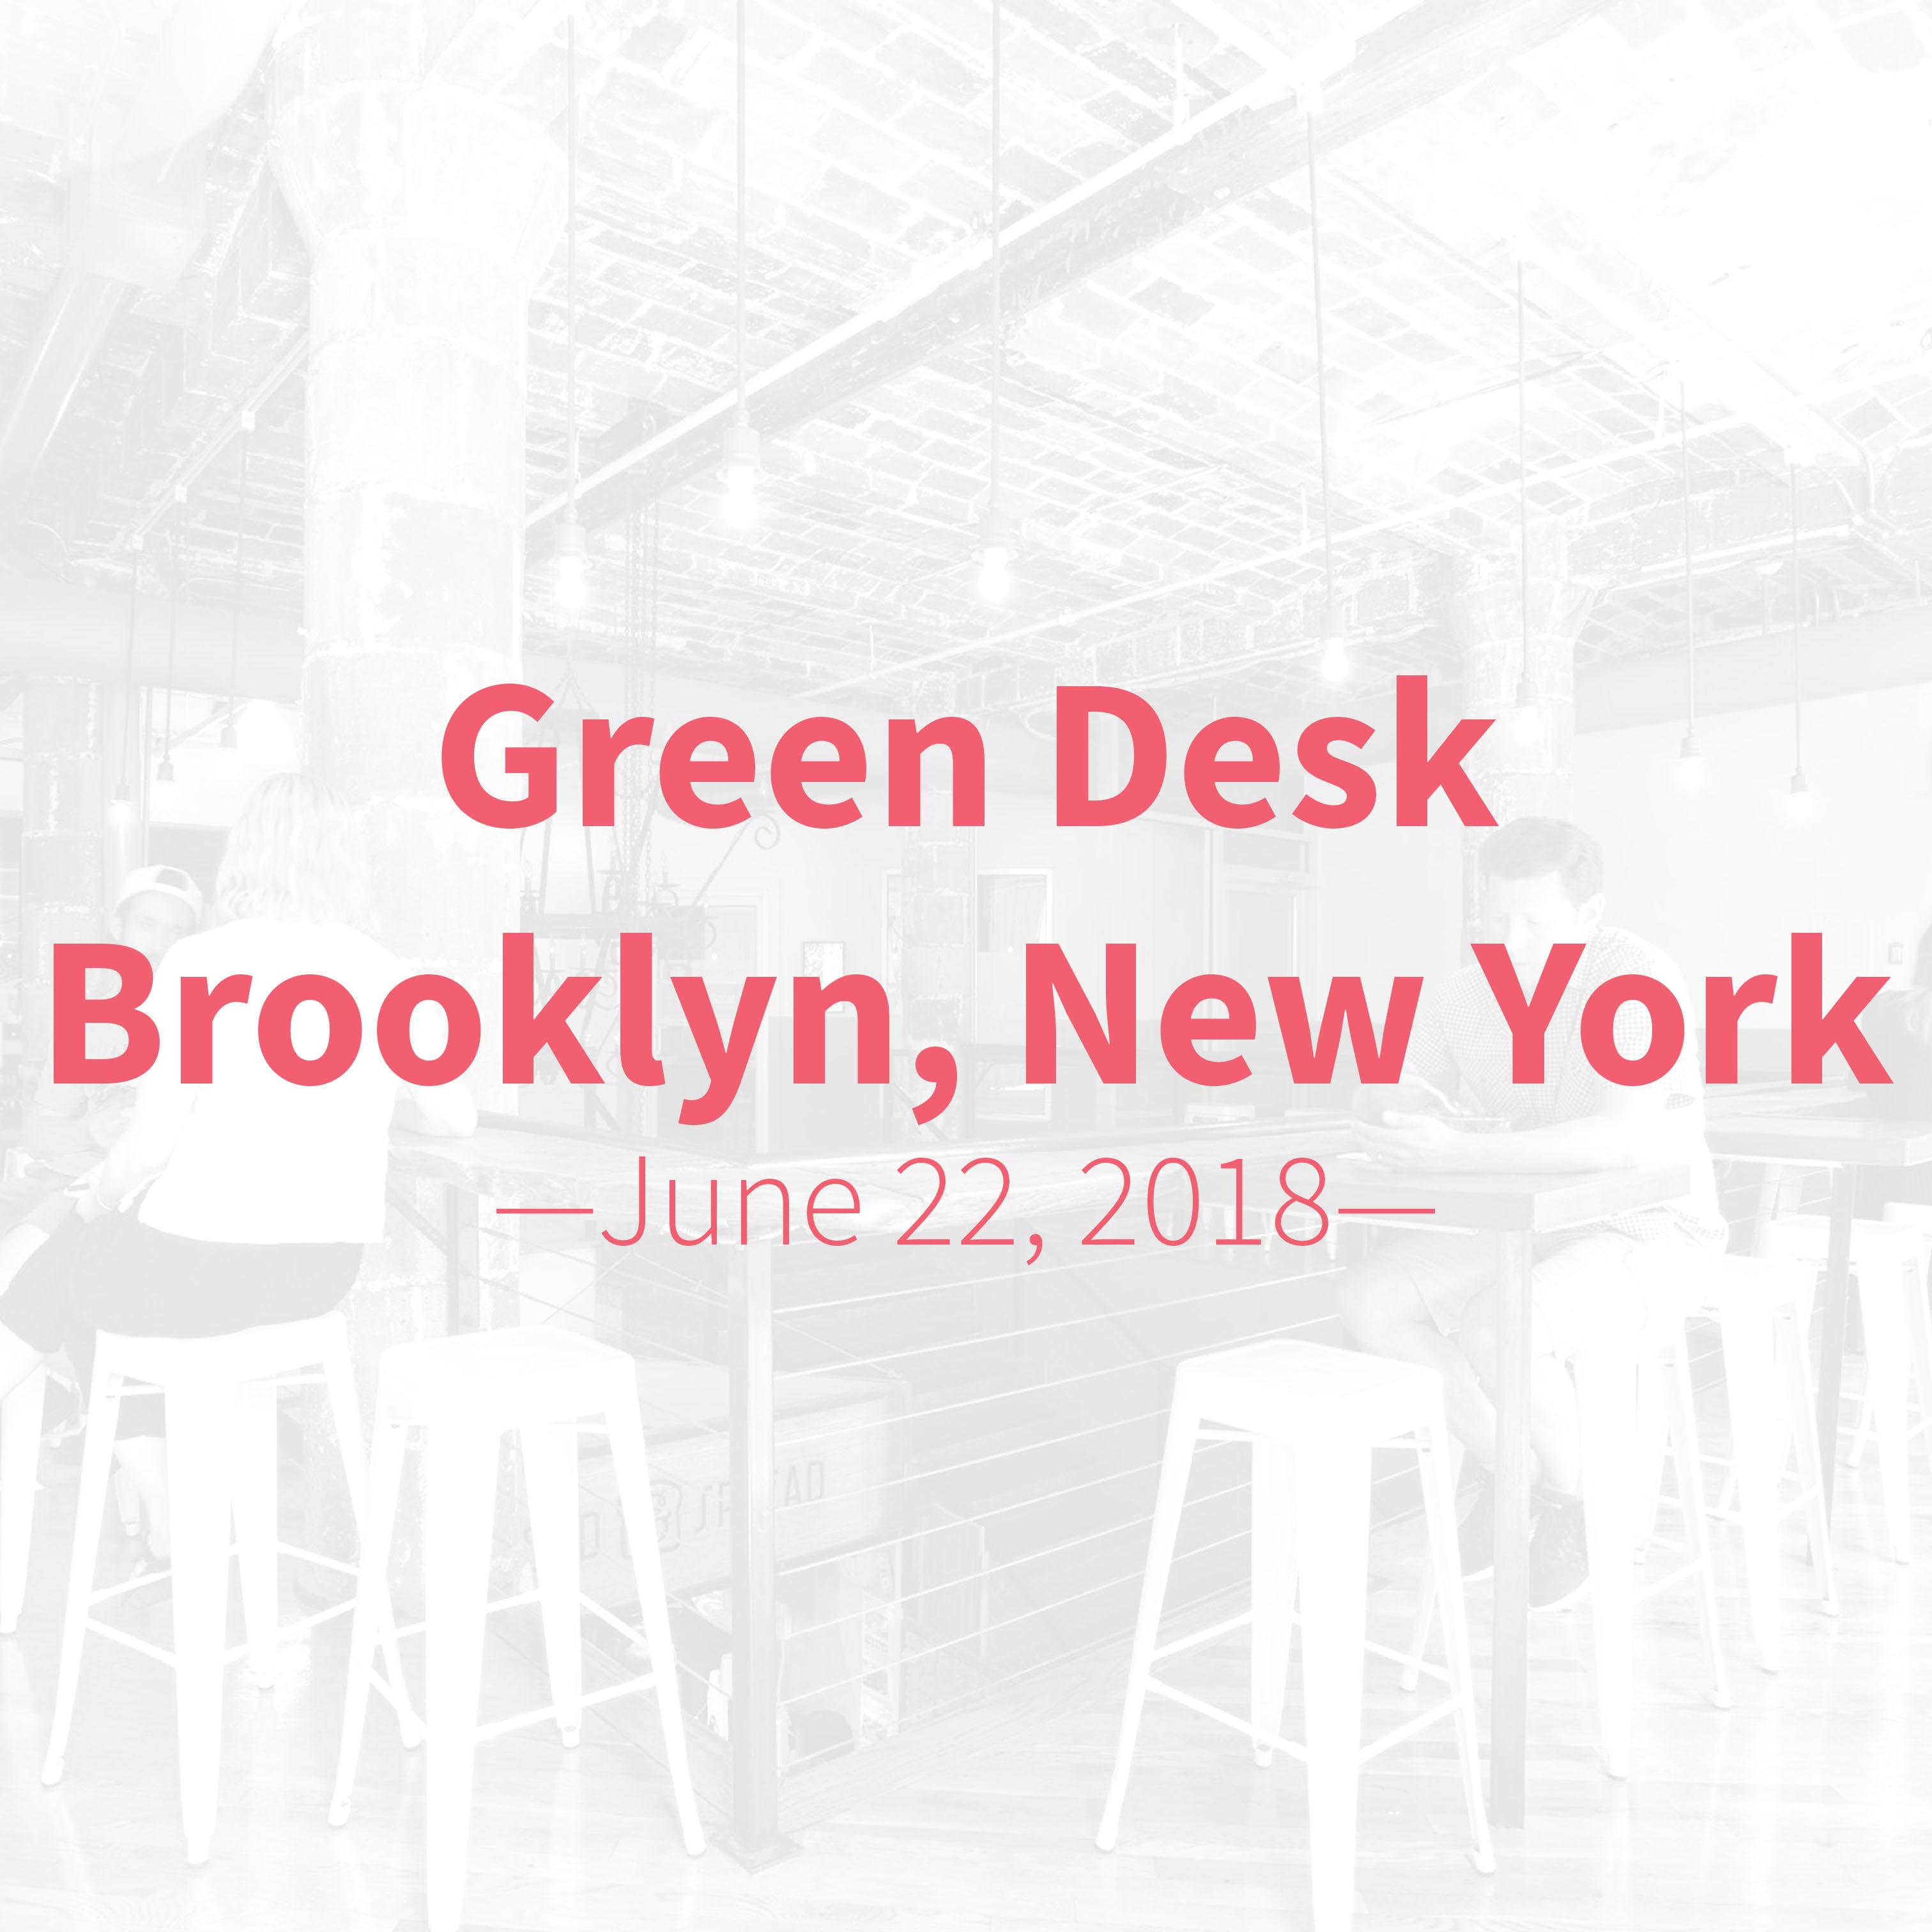 tableau data visualization workshop at green desk coworking in brooklyn new york